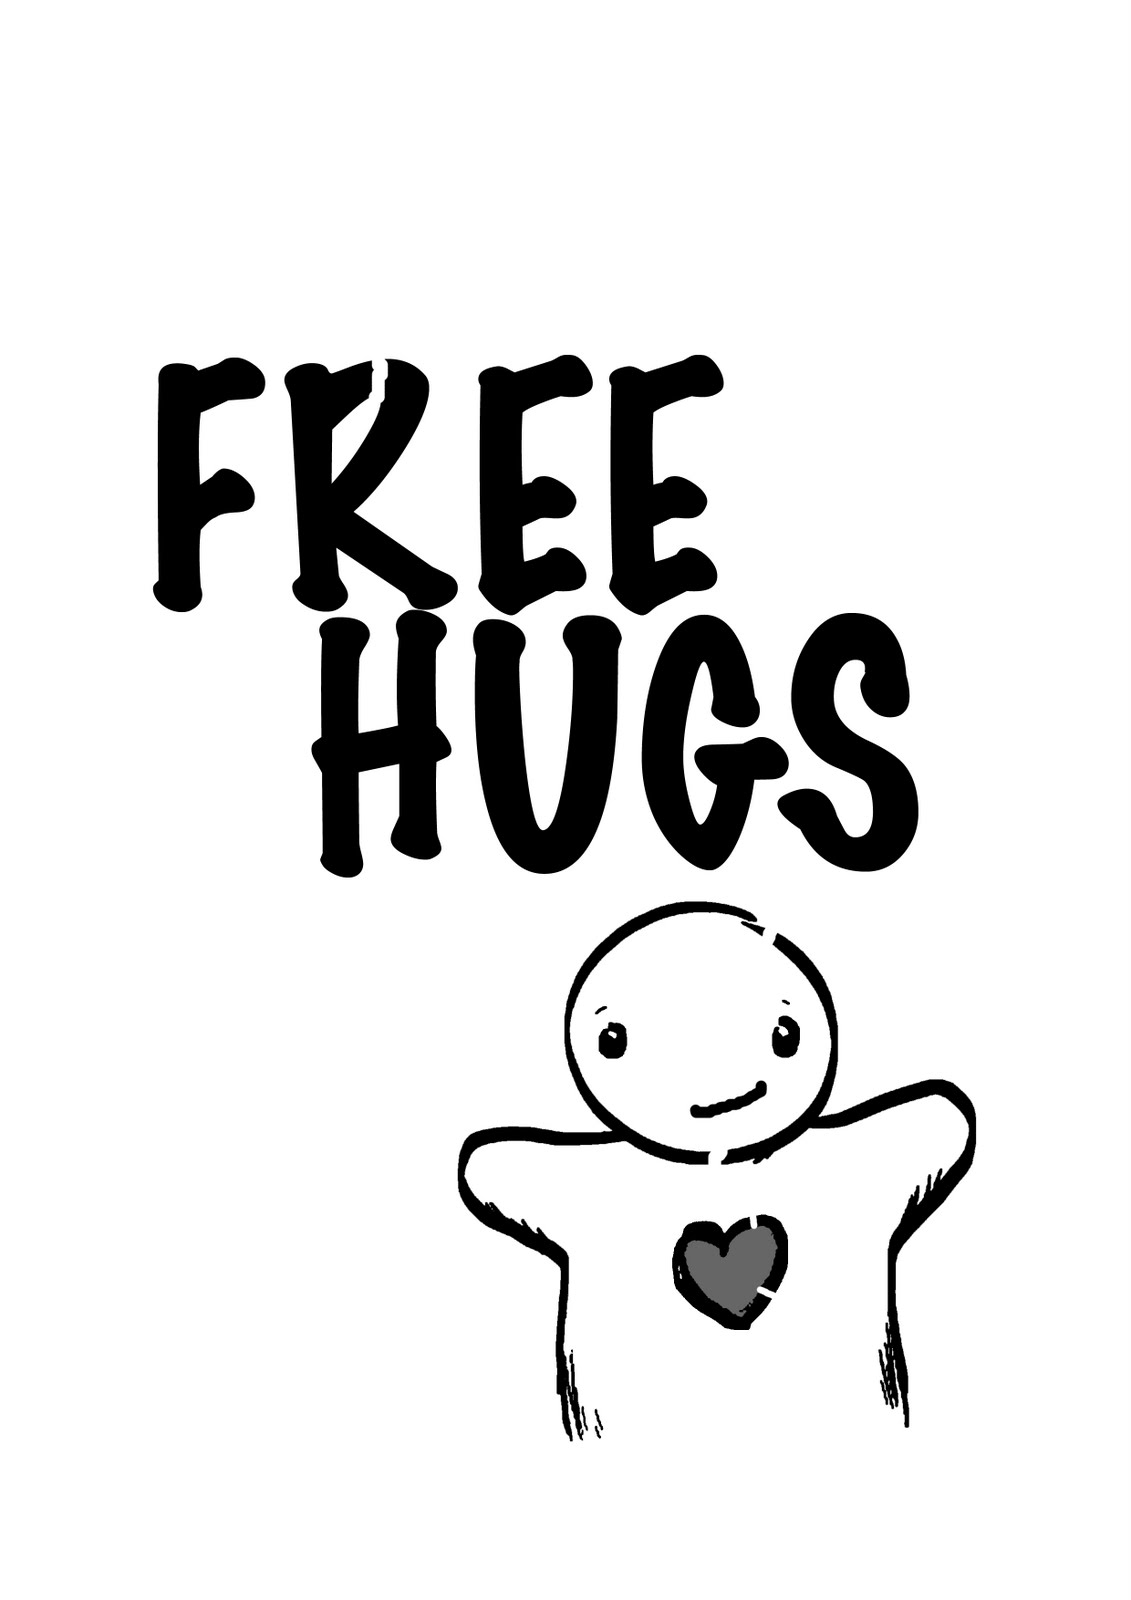 http://2.bp.blogspot.com/_Mg2m6Hu__sY/SwpgY9b-1II/AAAAAAAAHv8/73PPtDHJxs8/s1600/free+hugs2.jpg